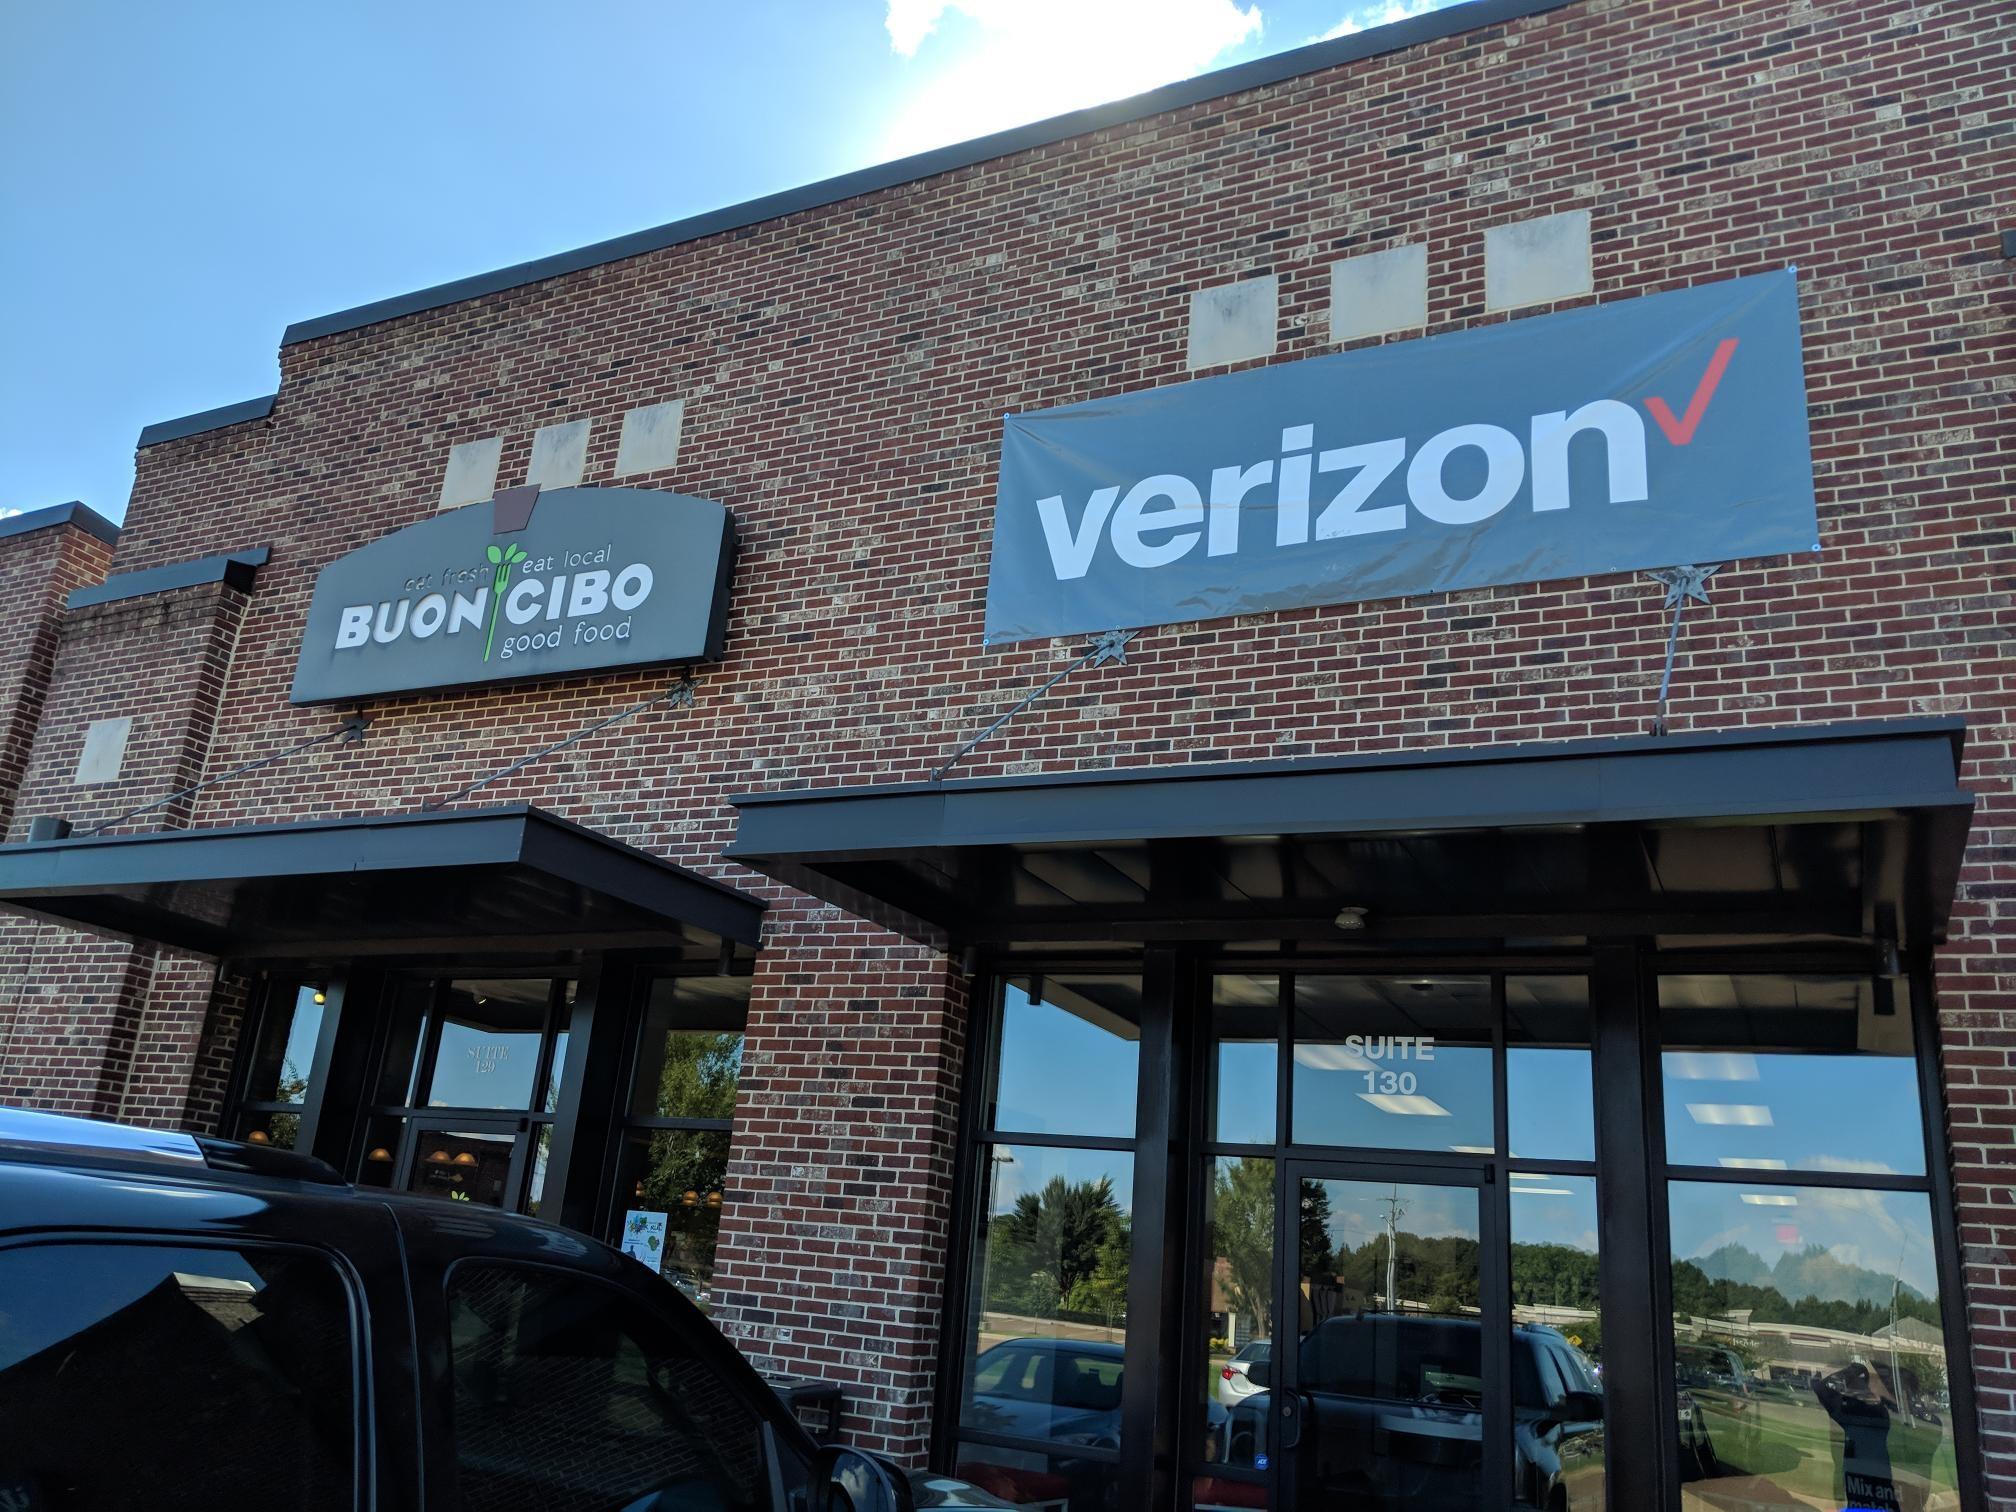 Verizon Authorized Retailer - Wireless Zone image 1